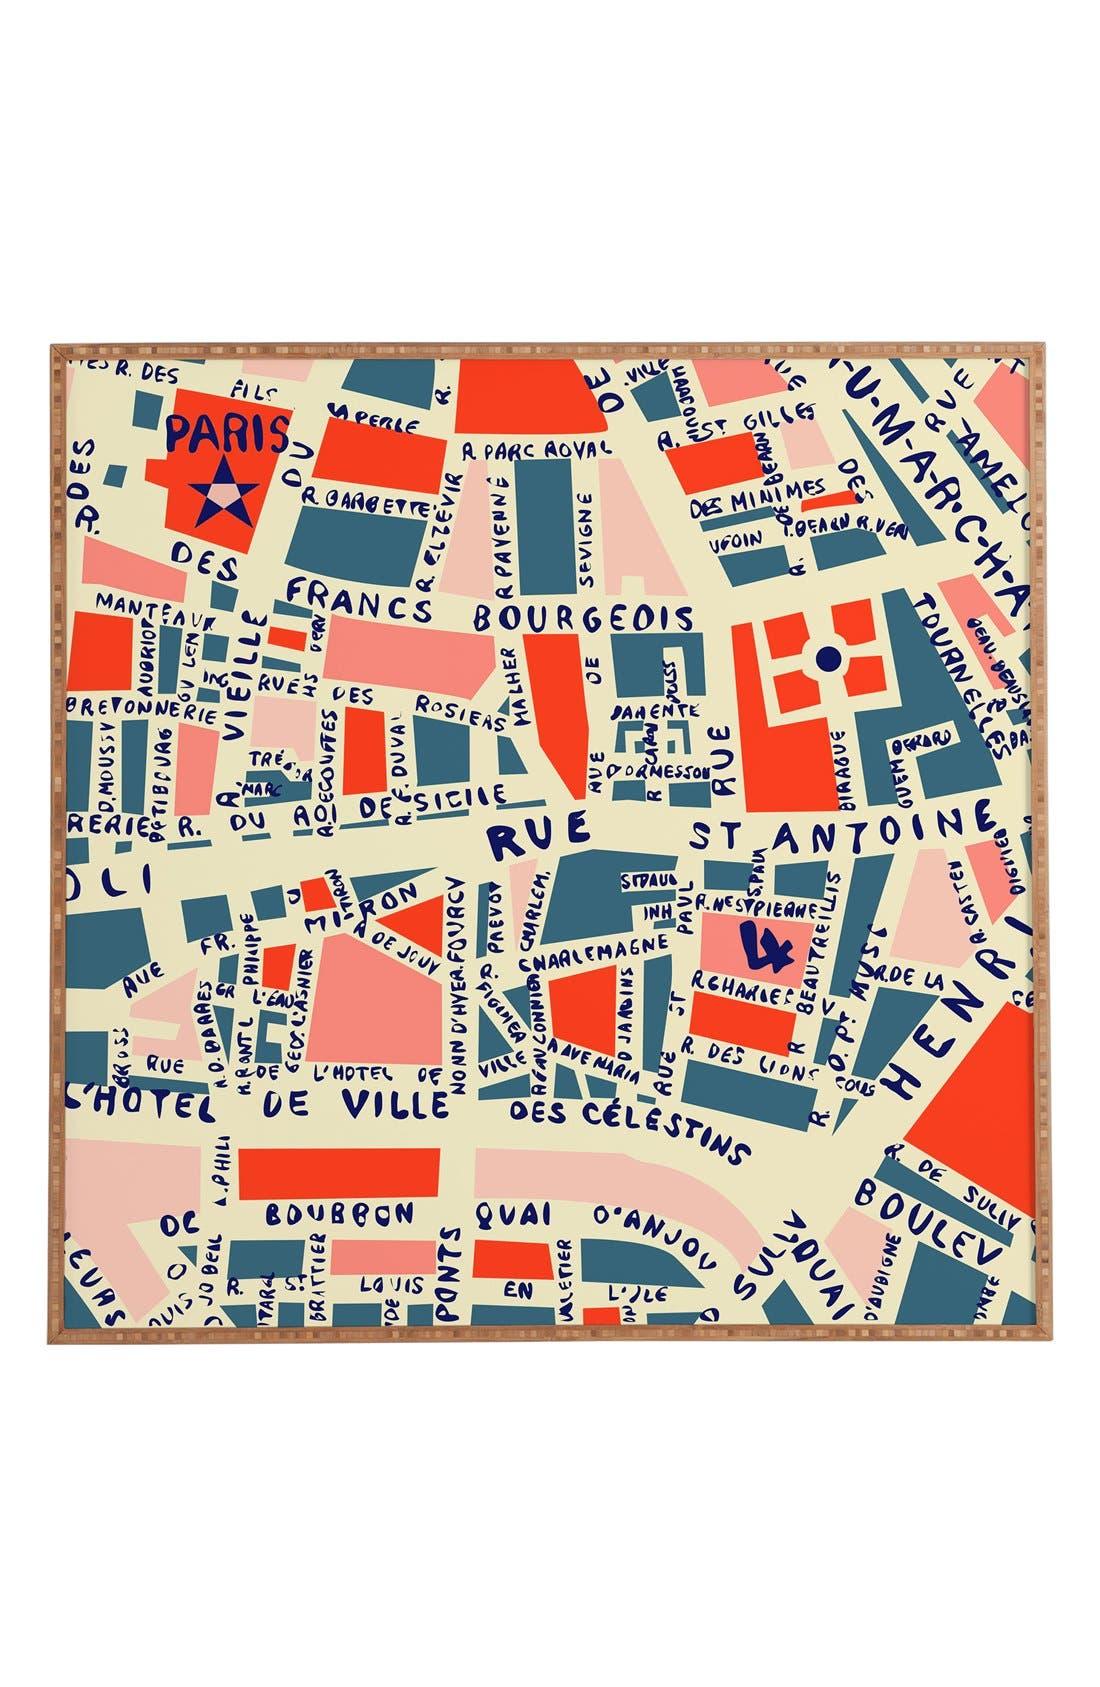 DENY DESIGNS 'Paris Map' Wall Art